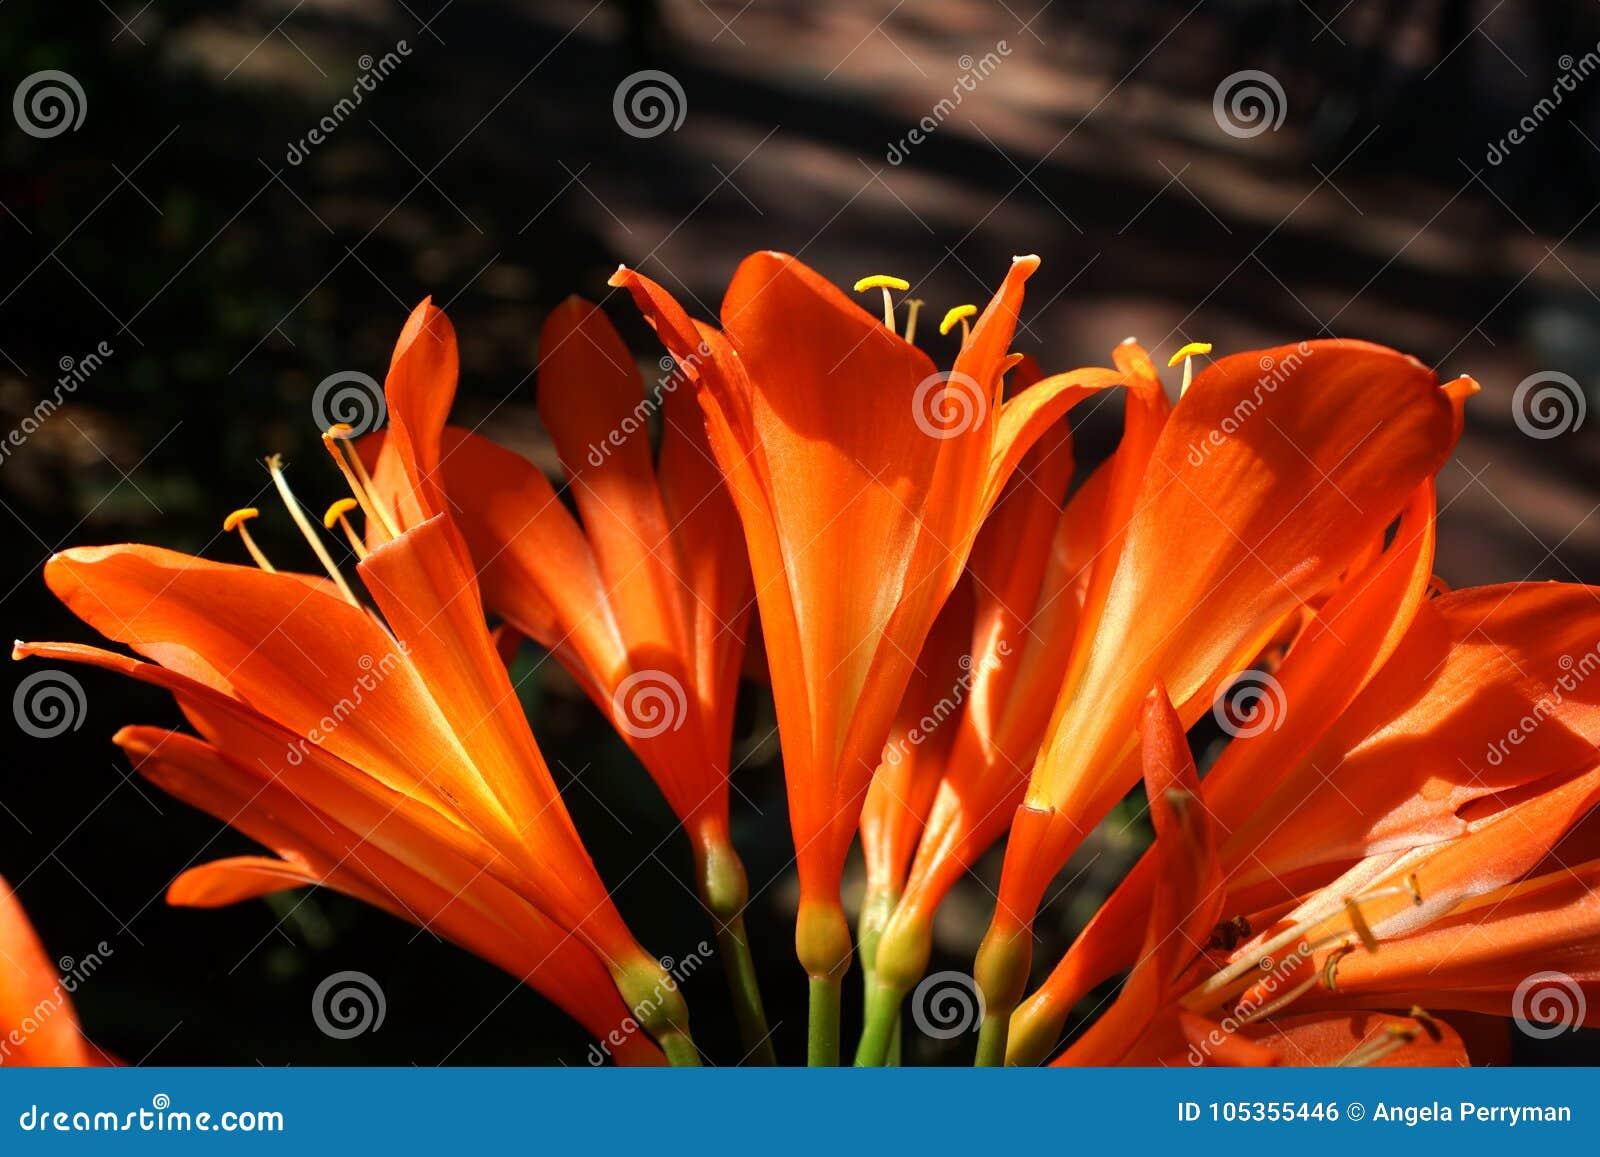 Clivia orange à Pretoria, Afrique du Sud